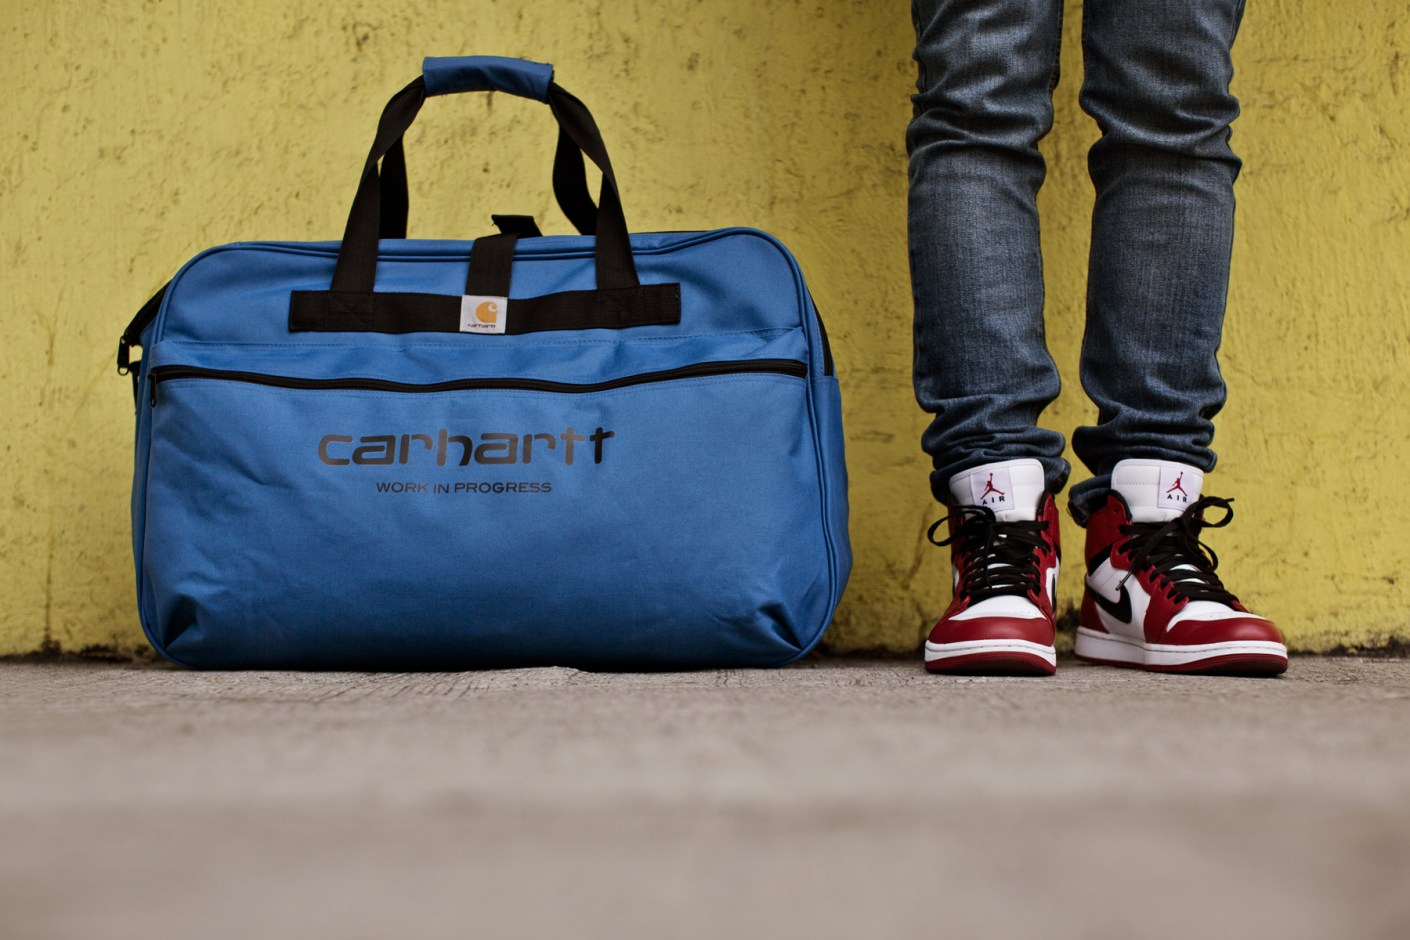 Image of Carhartt WIP 2014 Spring/Summer Duffle Bags